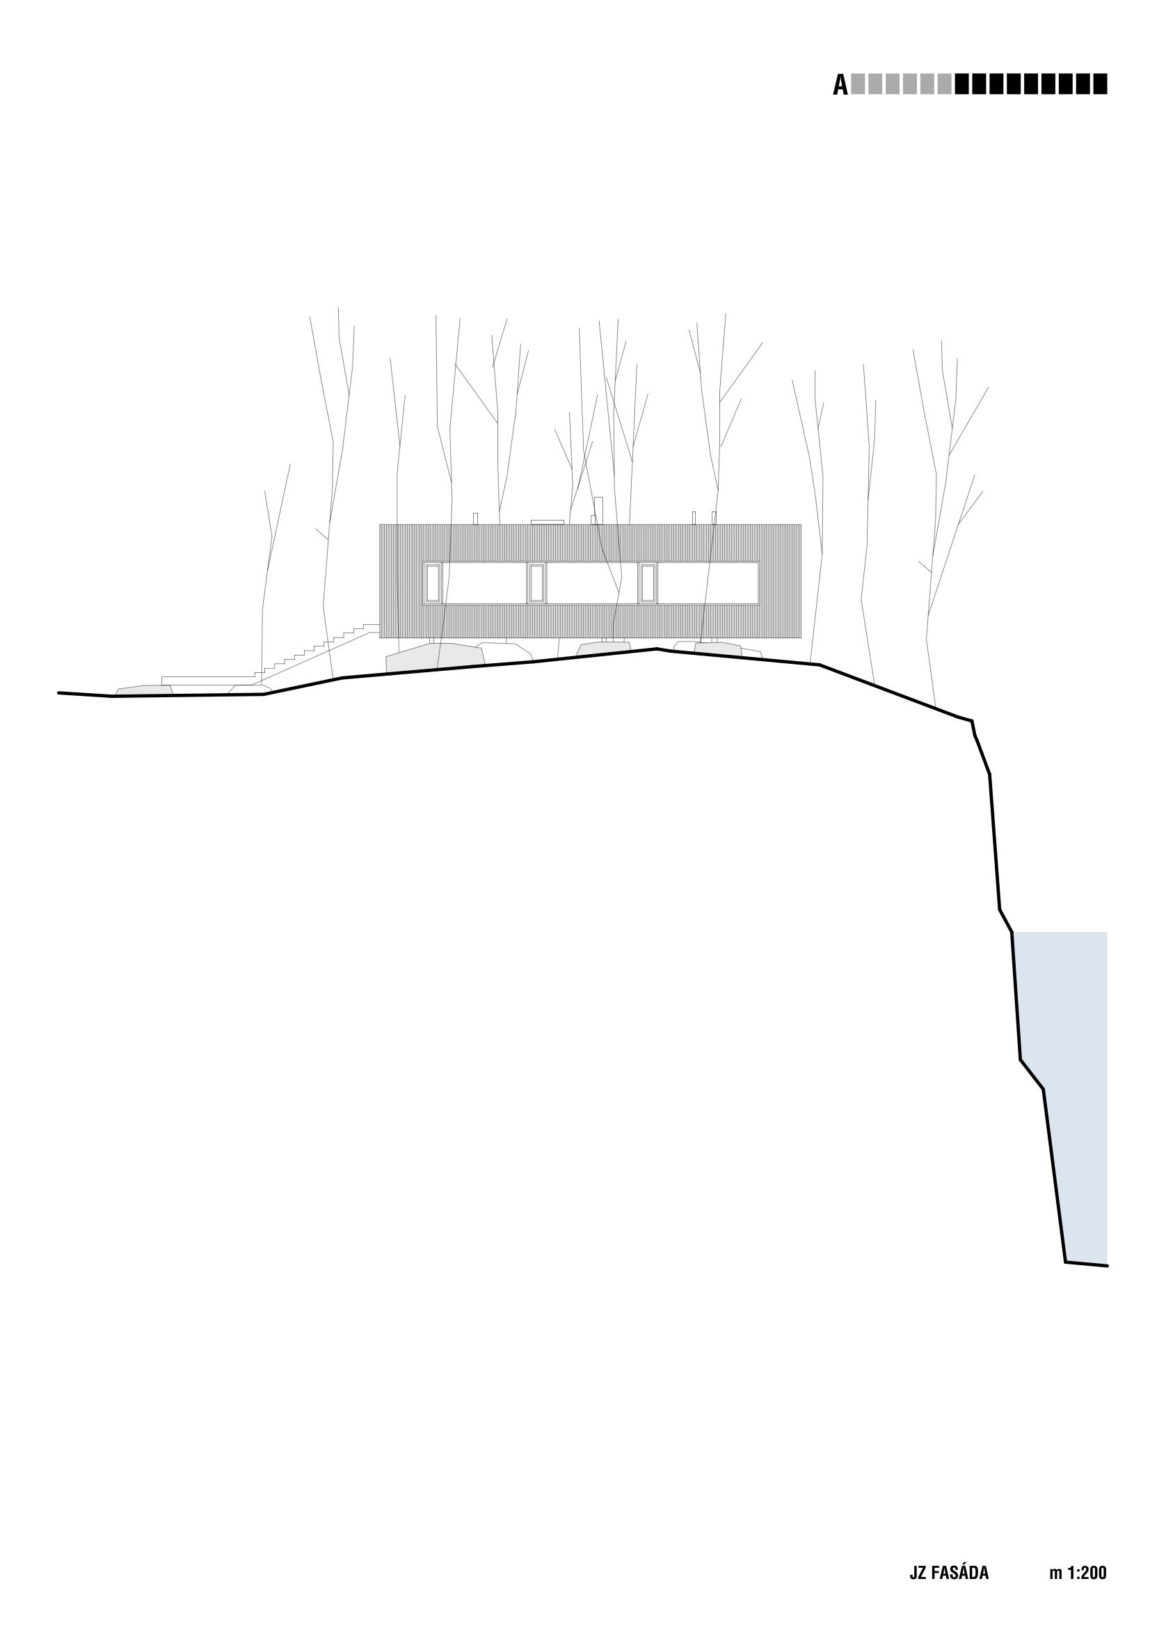 A Prototype of a Family House by a69 Architekti (15)